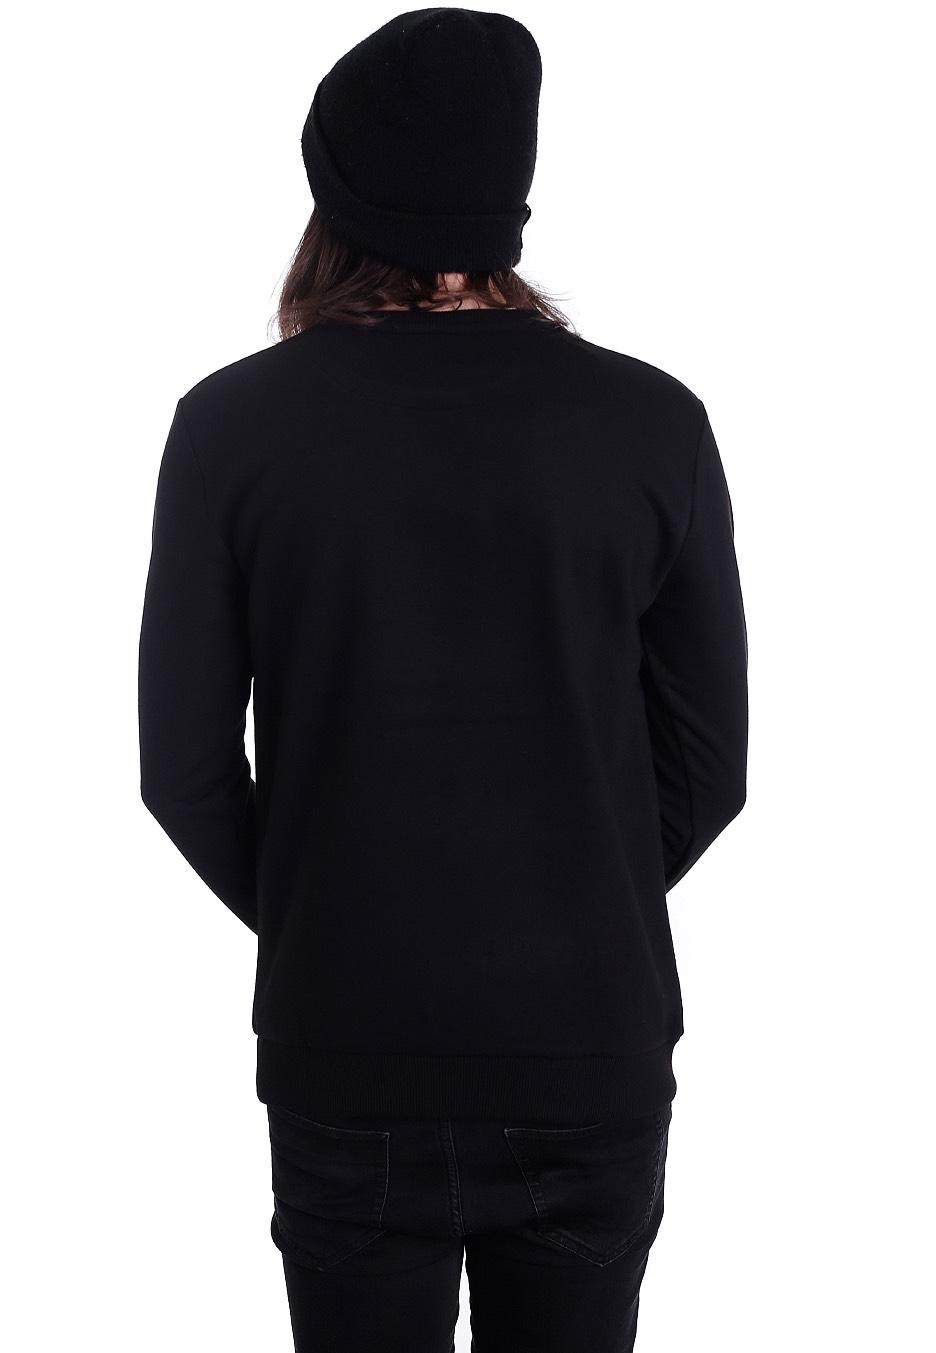 Circle Sweater: Streetwear Shop